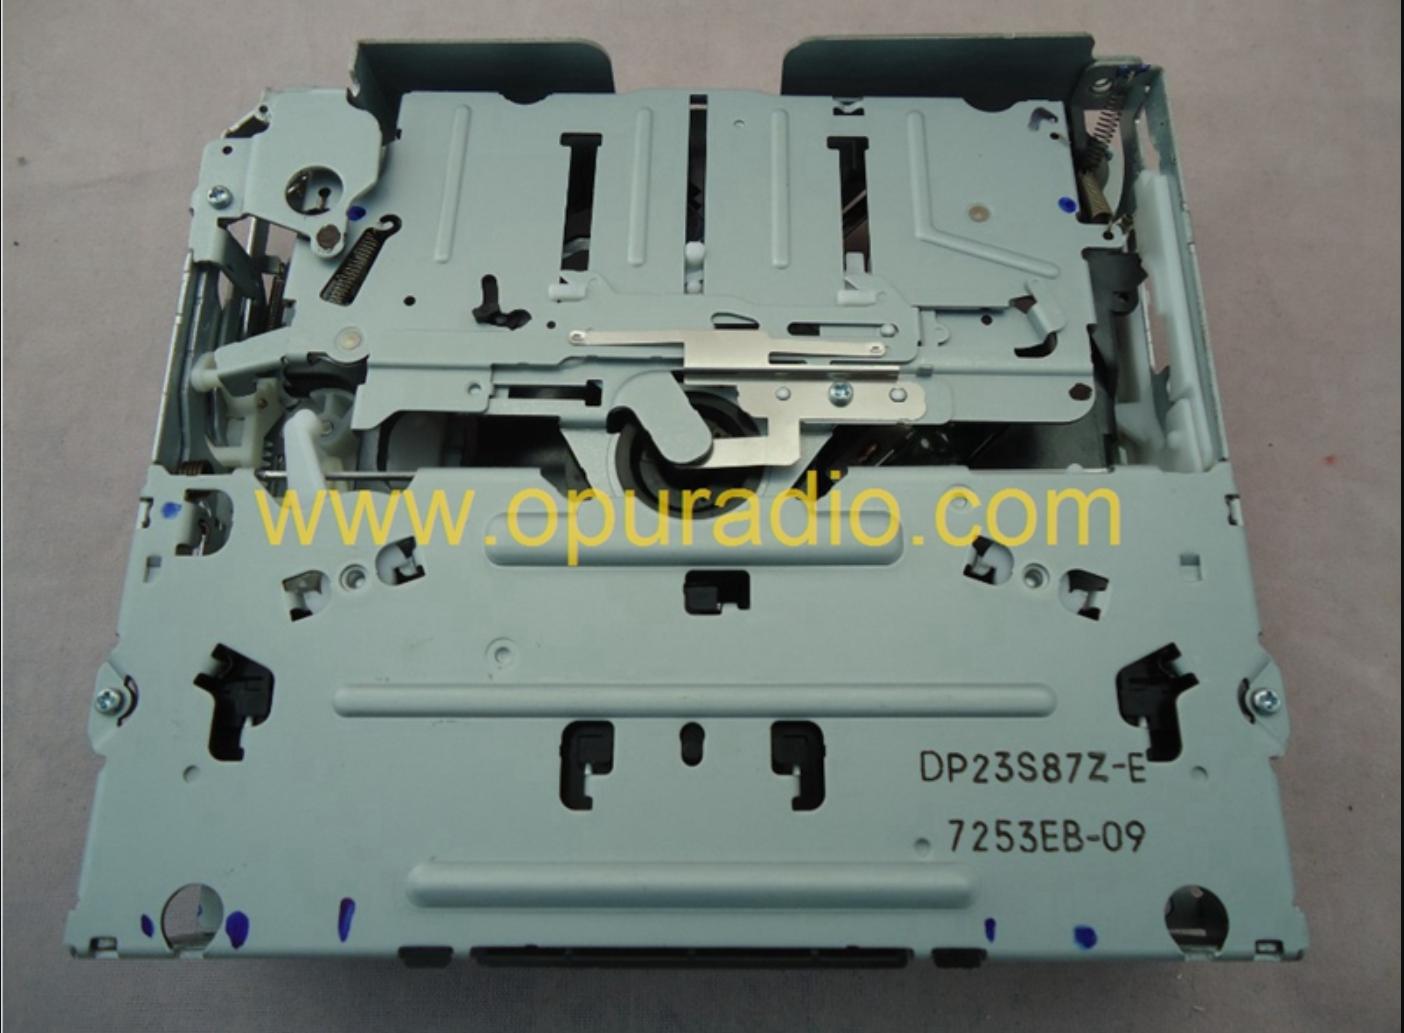 ... mechanism exact PCB for Mercedes Audio 20 MF2311 W211 E-Class CLS C219  A2118701289 MF3530 A2038700589 W203 C180-350 CLC MF2531 C55 MF2750  A1698700689 ...